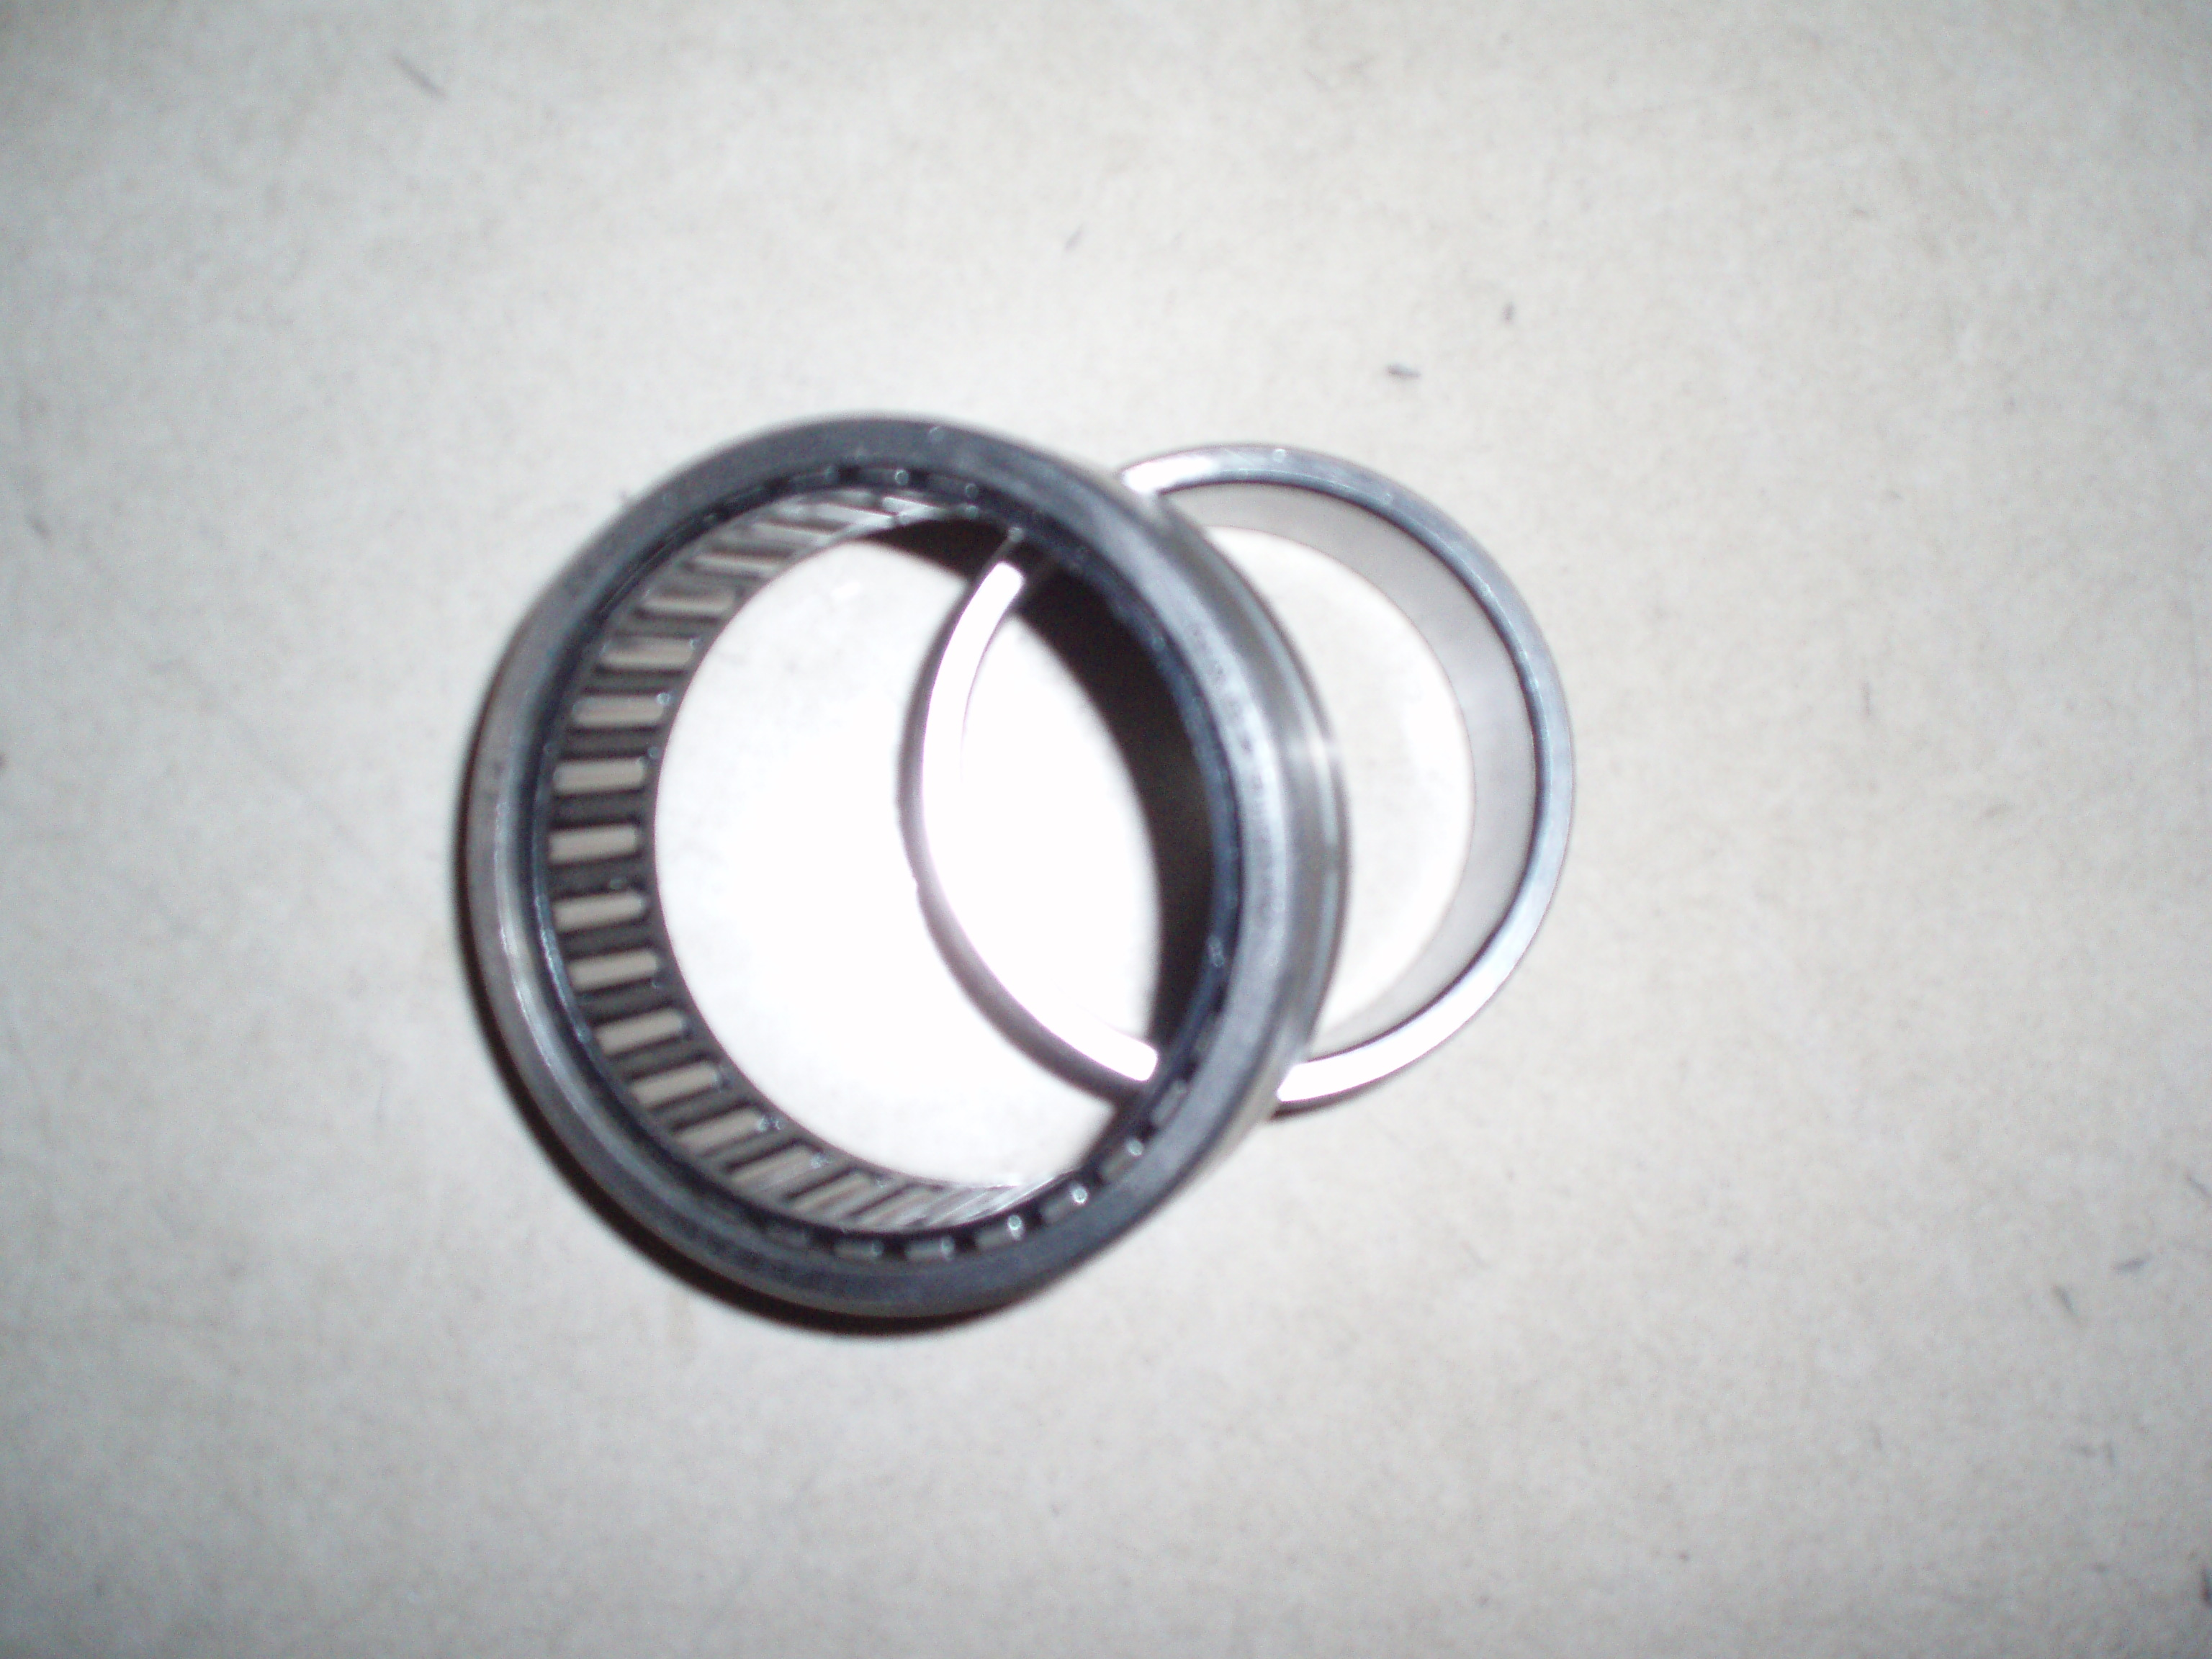 IKO轴承 IKO滚针轴承 iko日本进口轴承 滚针IKO轴承